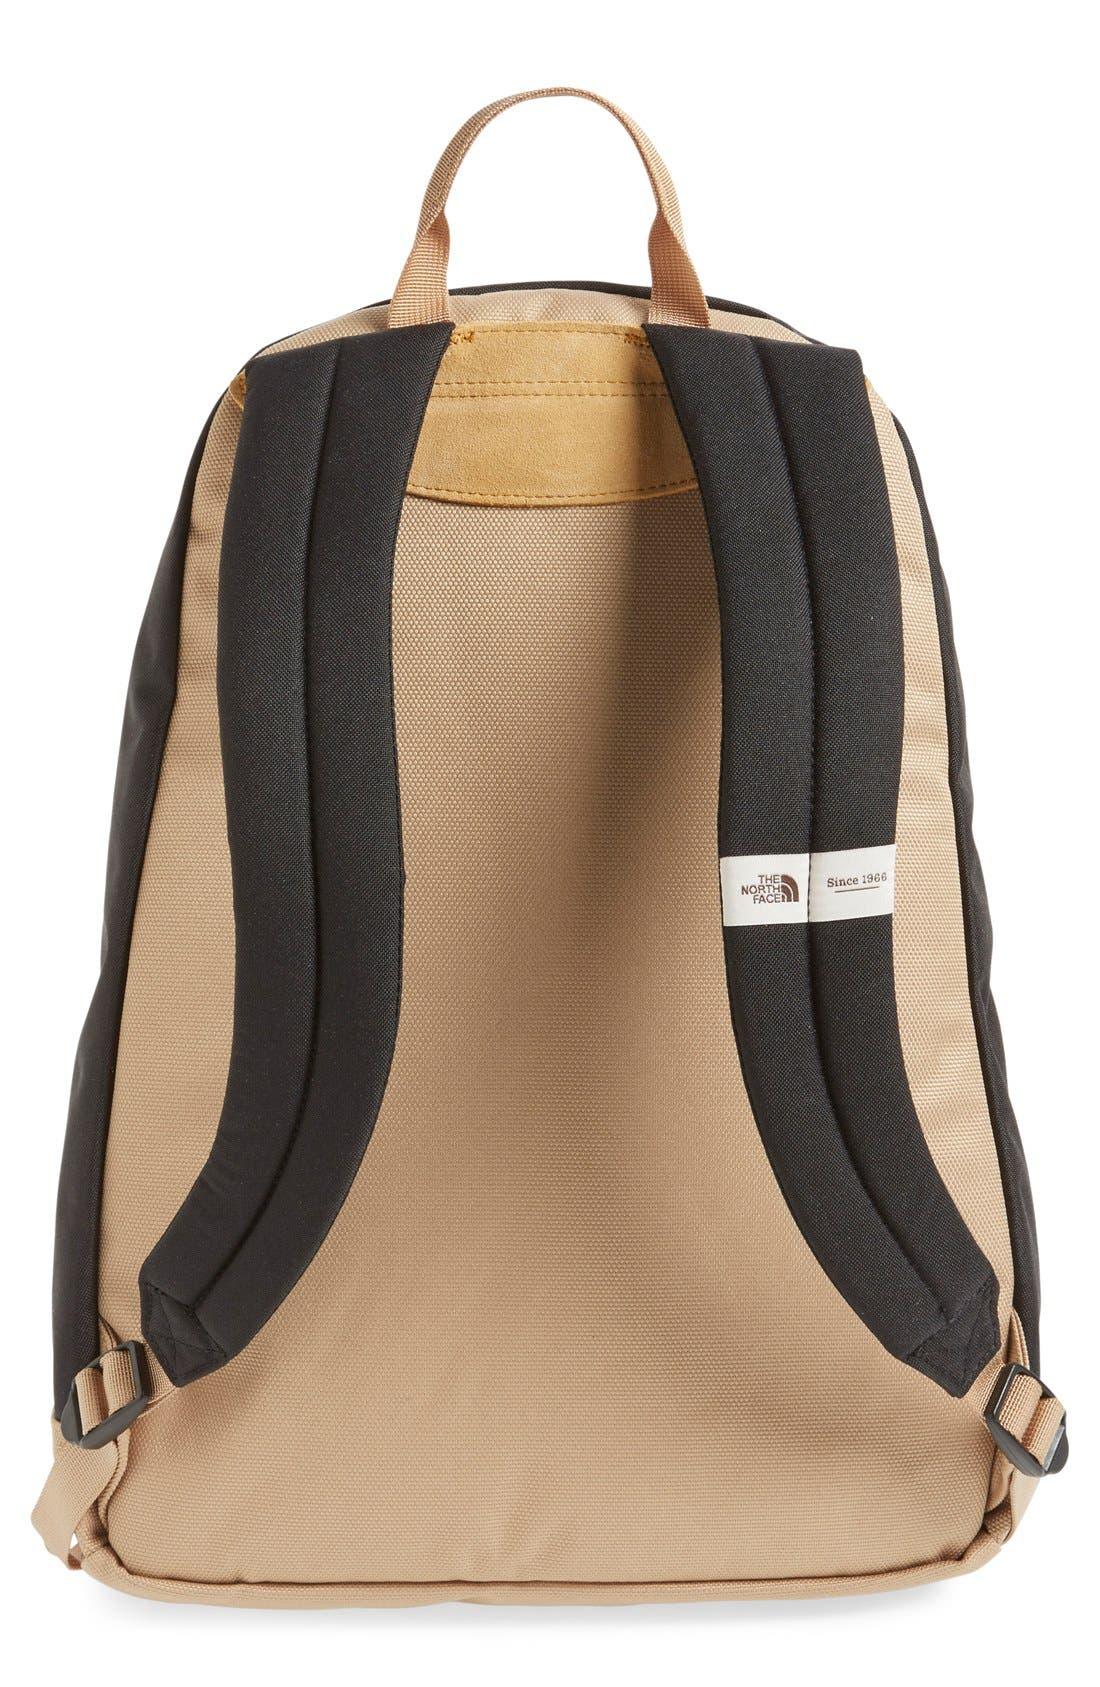 THE NORTH FACE,                             'Mini Berkeley' Backpack,                             Alternate thumbnail 3, color,                             001